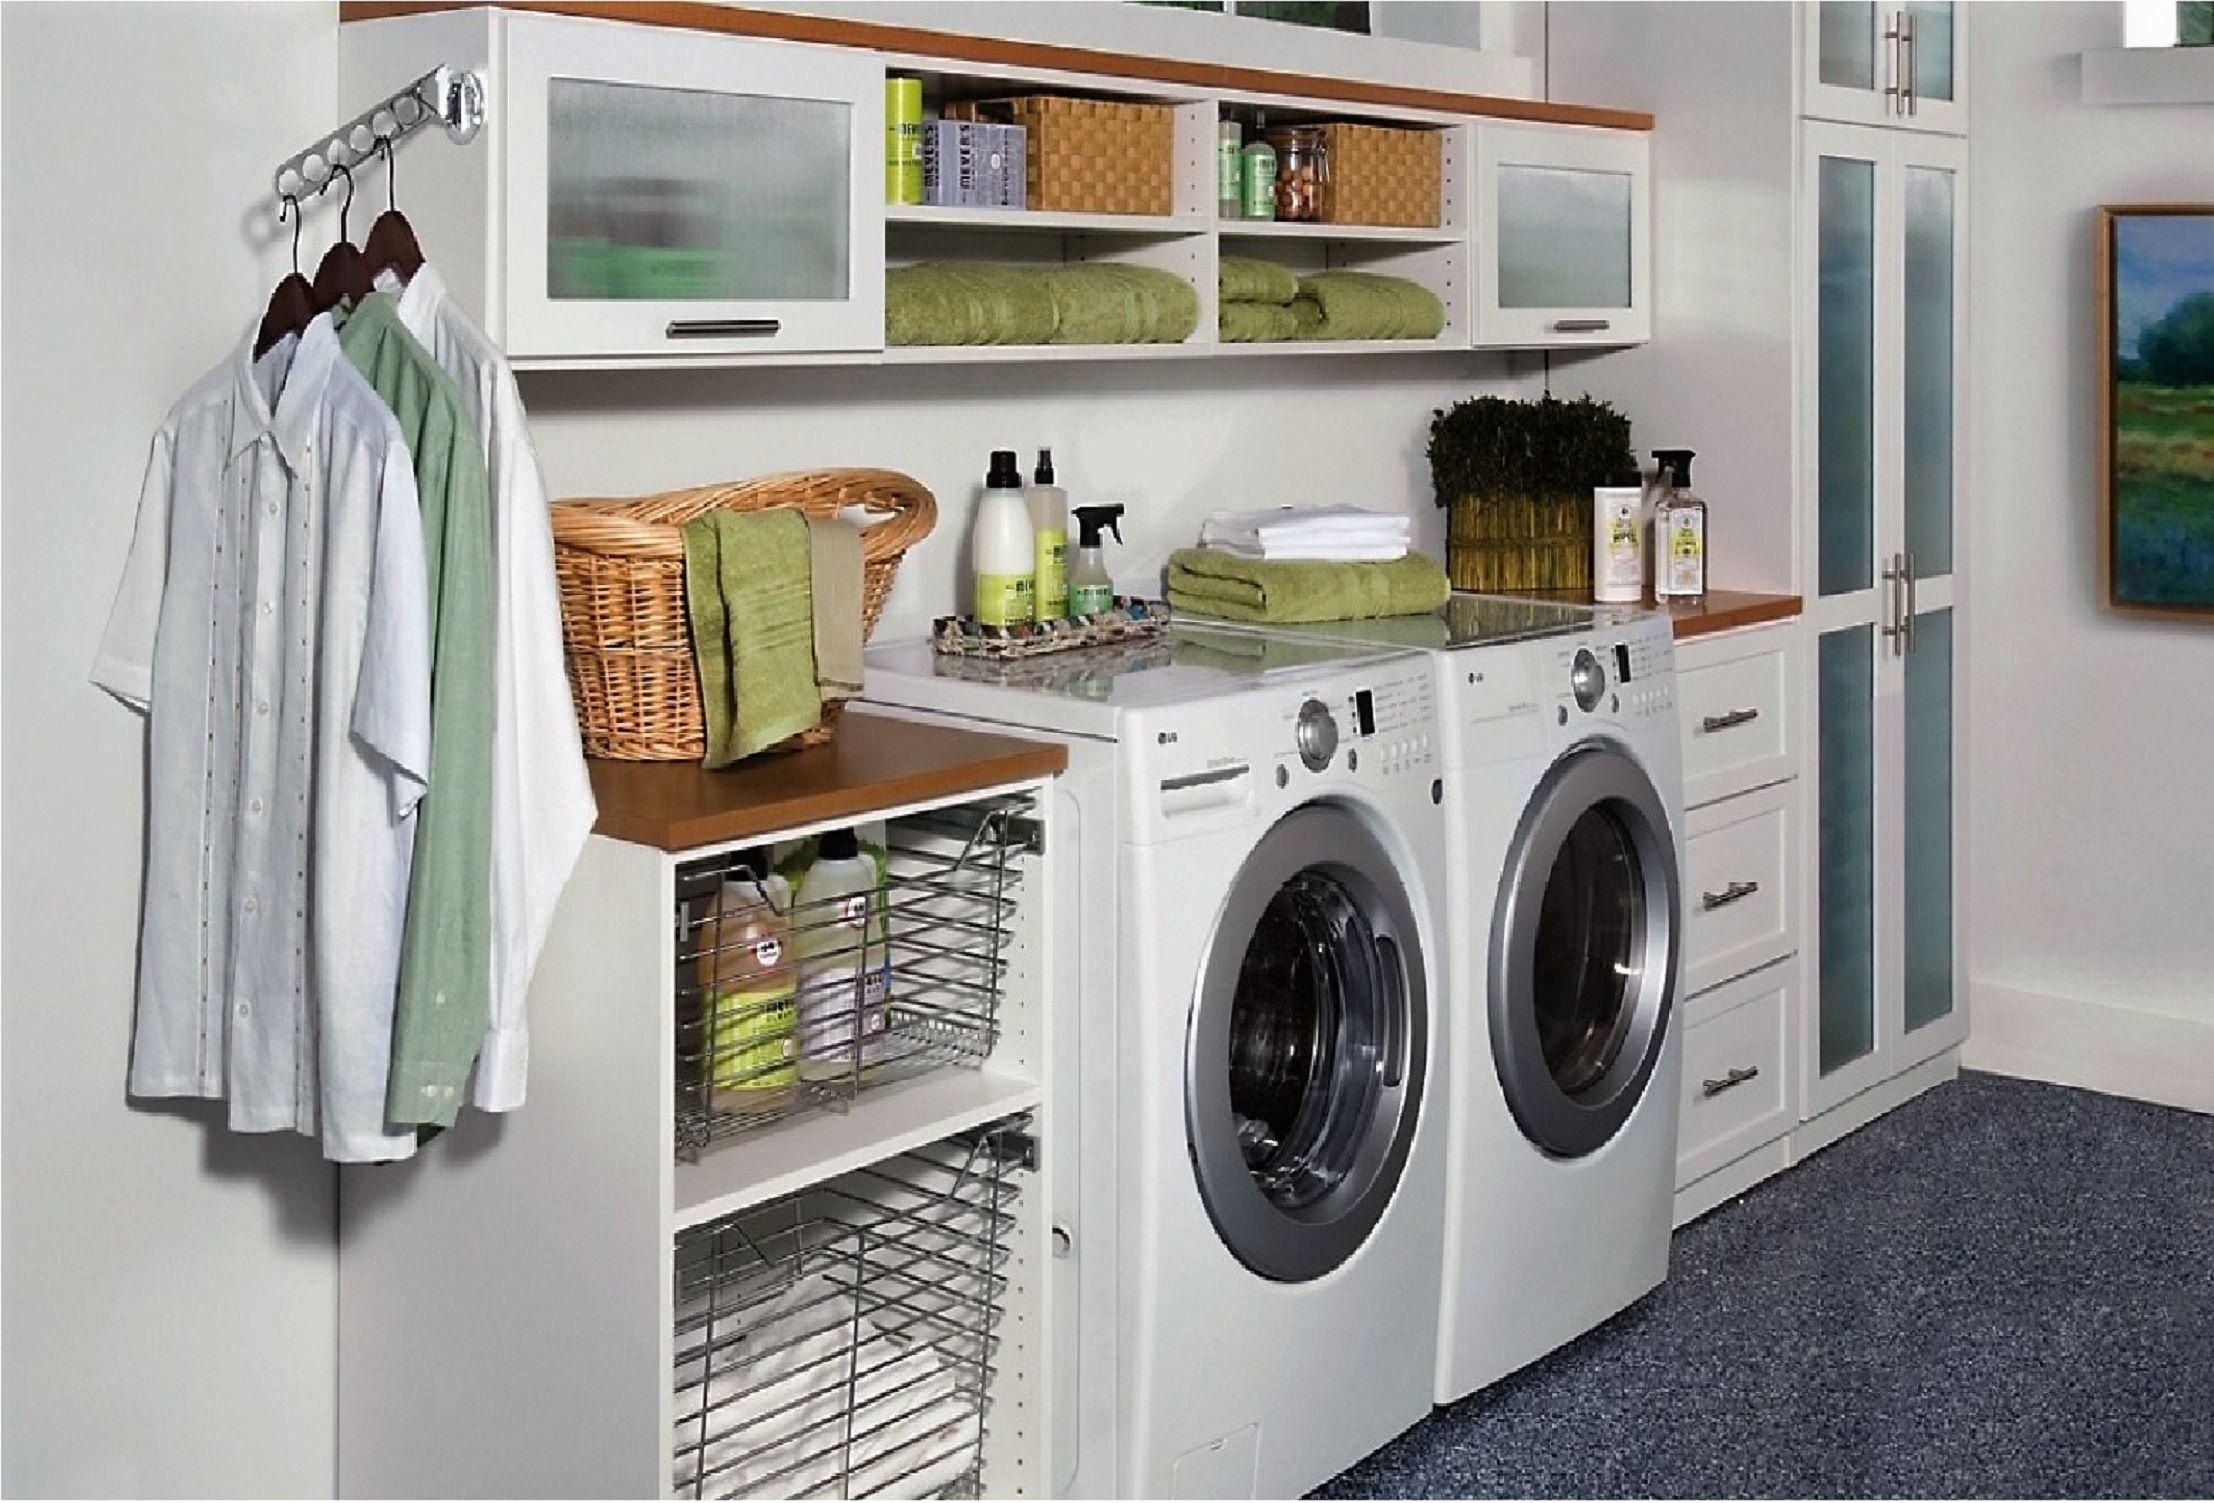 17 Inspiring Laundry Room Design Ideas